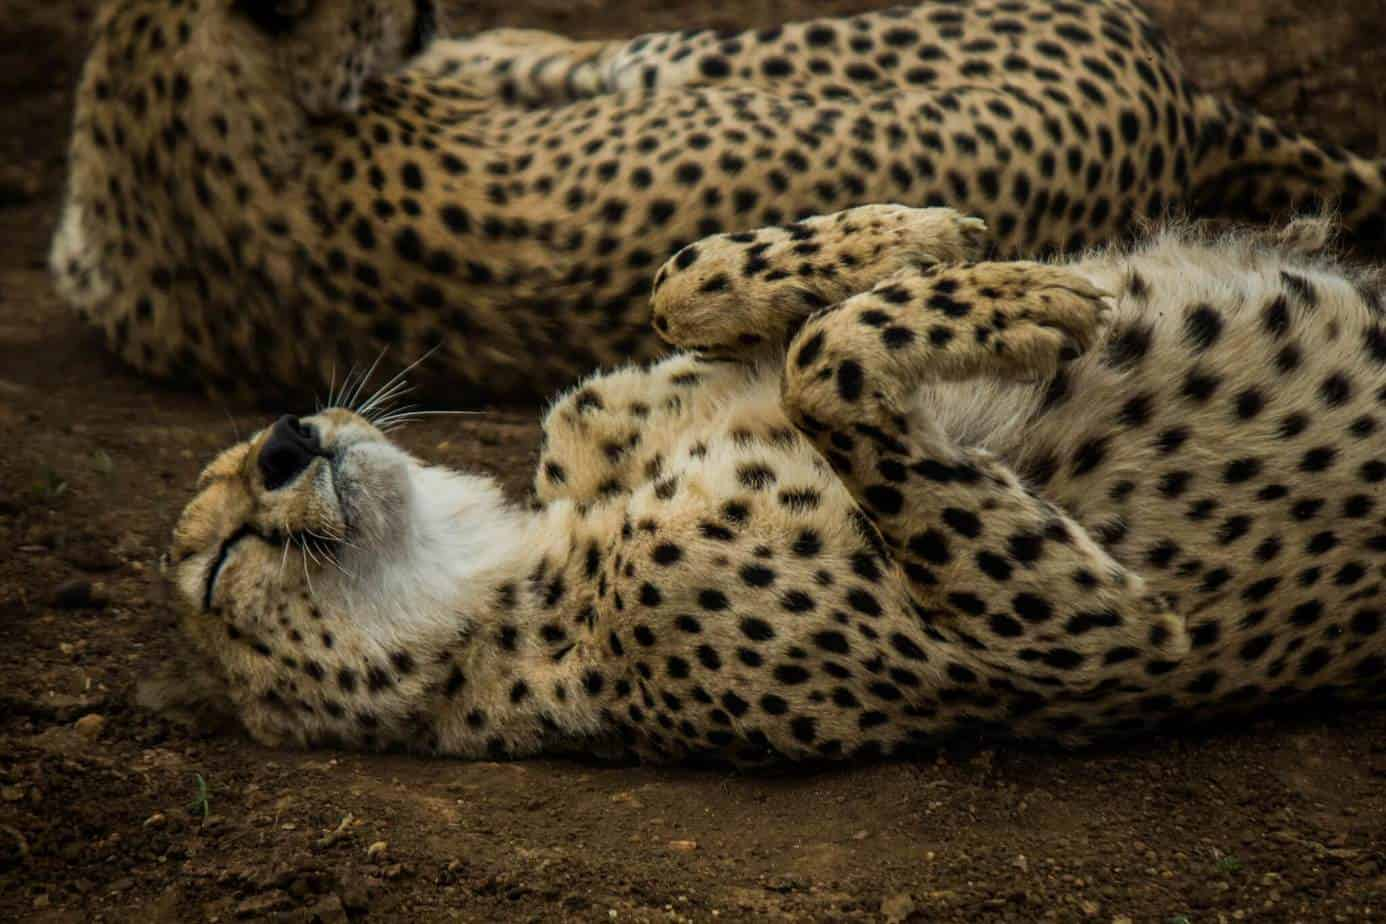 Gepard @ Thanda Private Game Reserve, Sør-Afrika. Foto: Håvard Rosenlund